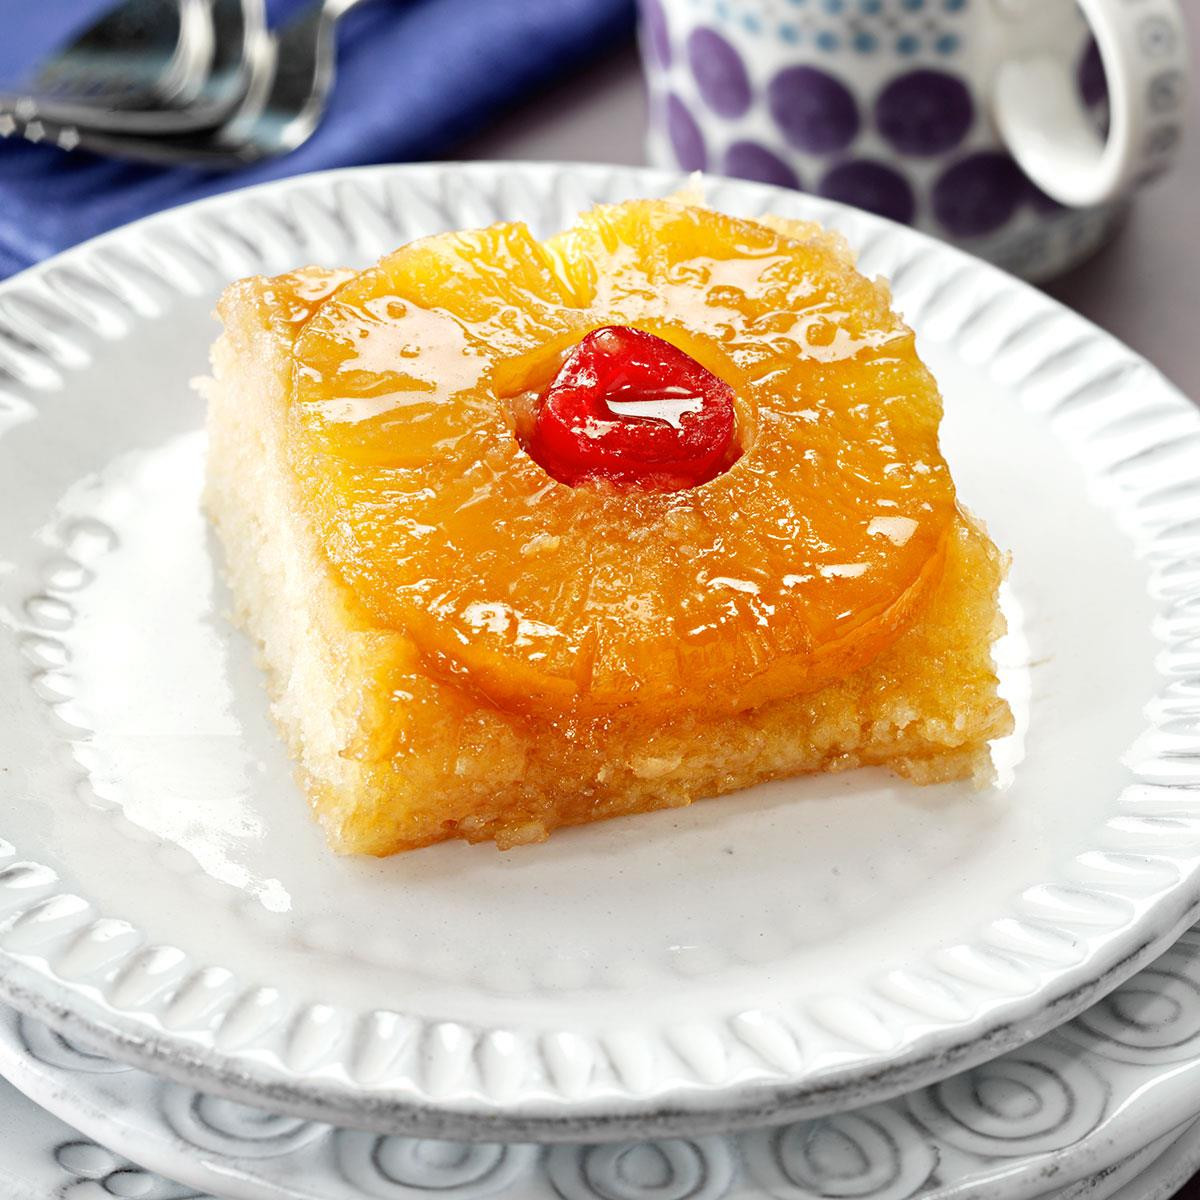 Recipe For Pineapple Upside Down Cake  Makeover Pineapple Upside Down Cake Recipe